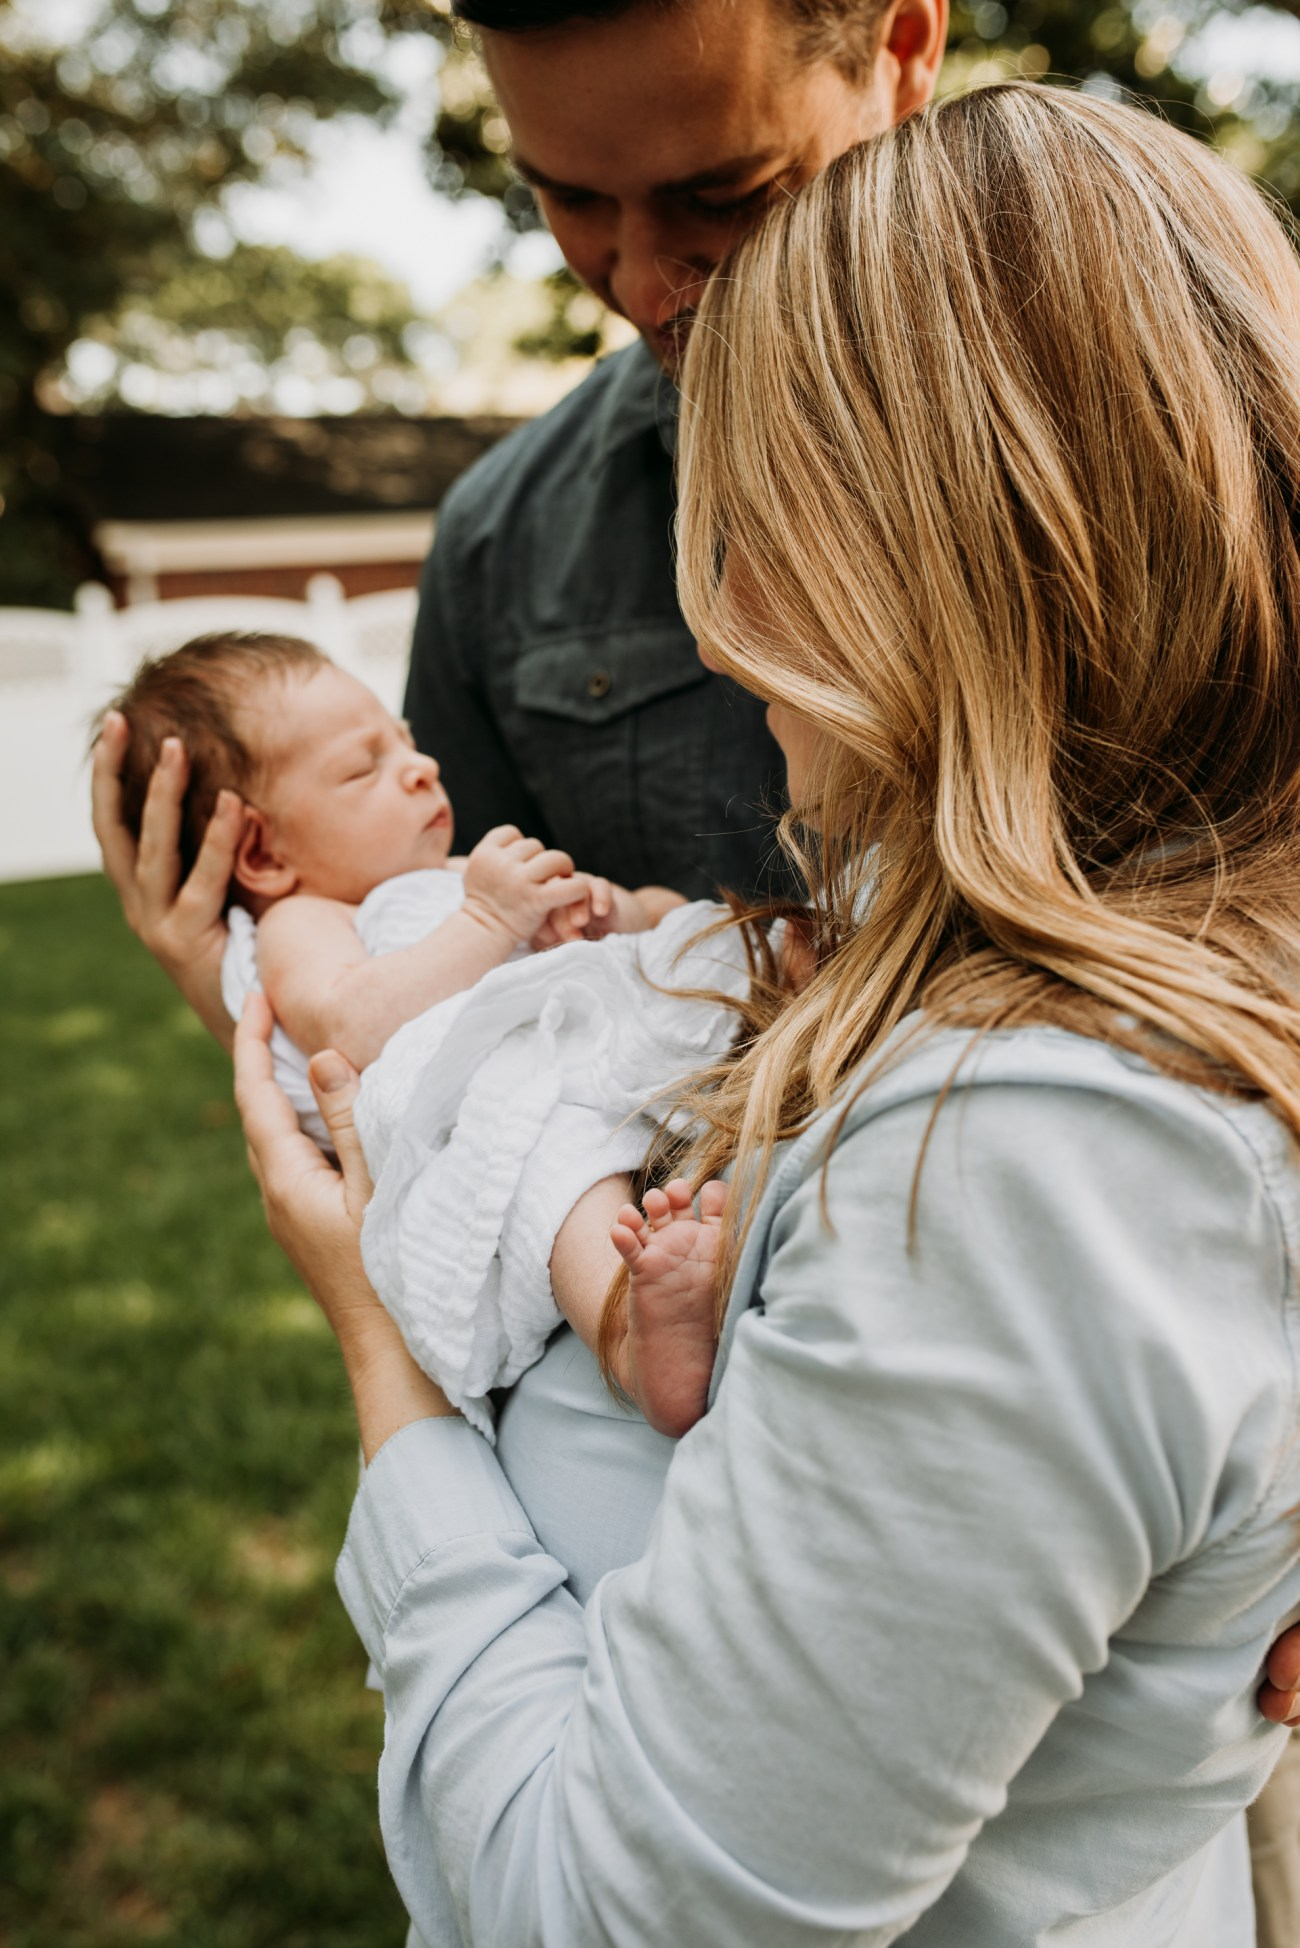 CamilleCamachoPhotography_Virginia_Lifestyle_Newborn-25